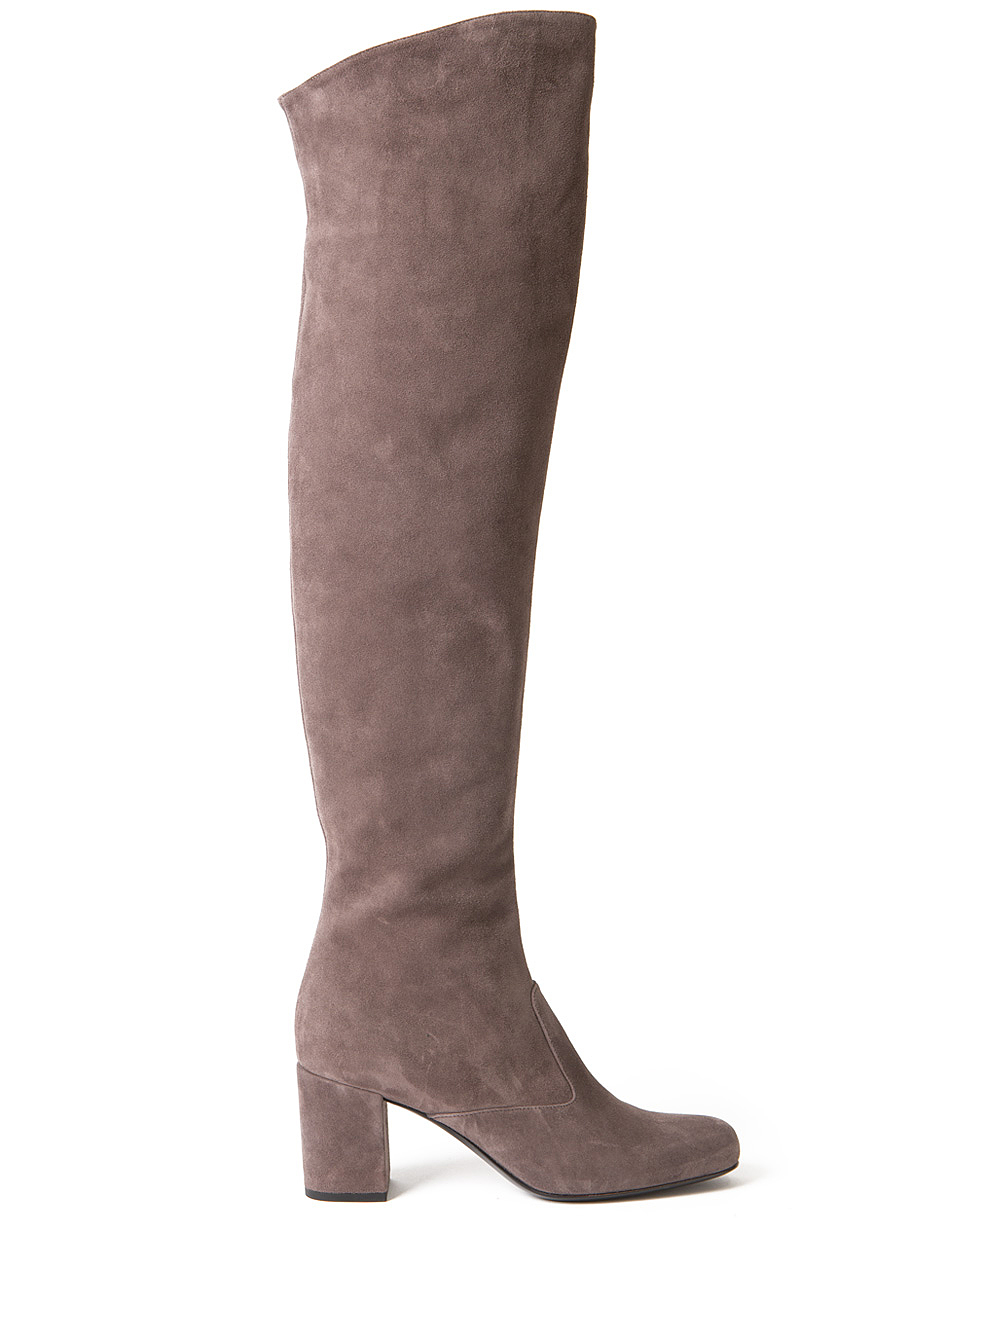 9caa3d430e4 Saint Laurent Babies Over The Knee Boots in Brown - Lyst